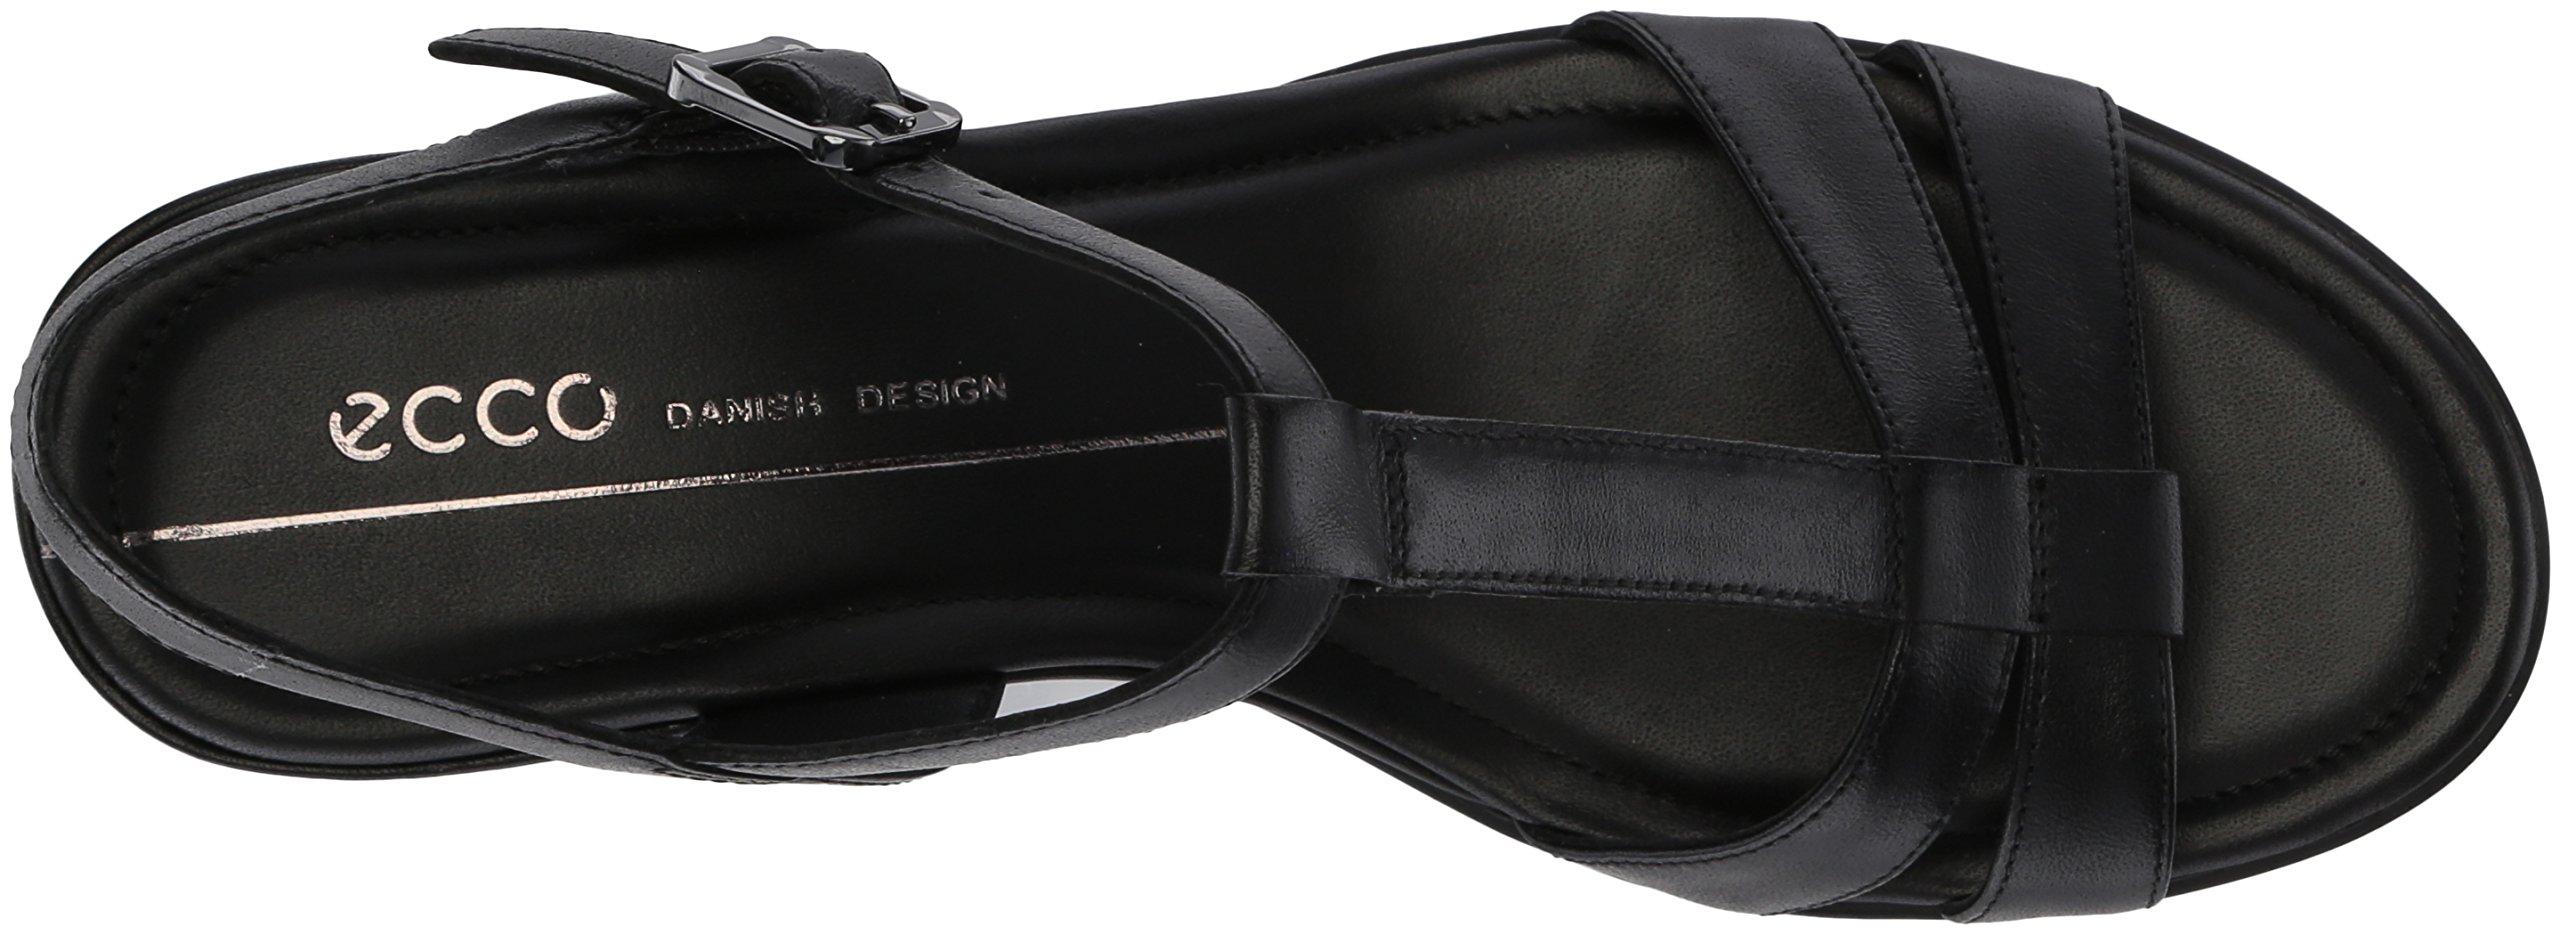 ECCO Women's Women's Shape 35 T-Strap Wedge Sandal, Black/Black, 37 M EU (6-6.5 US) by ECCO (Image #7)